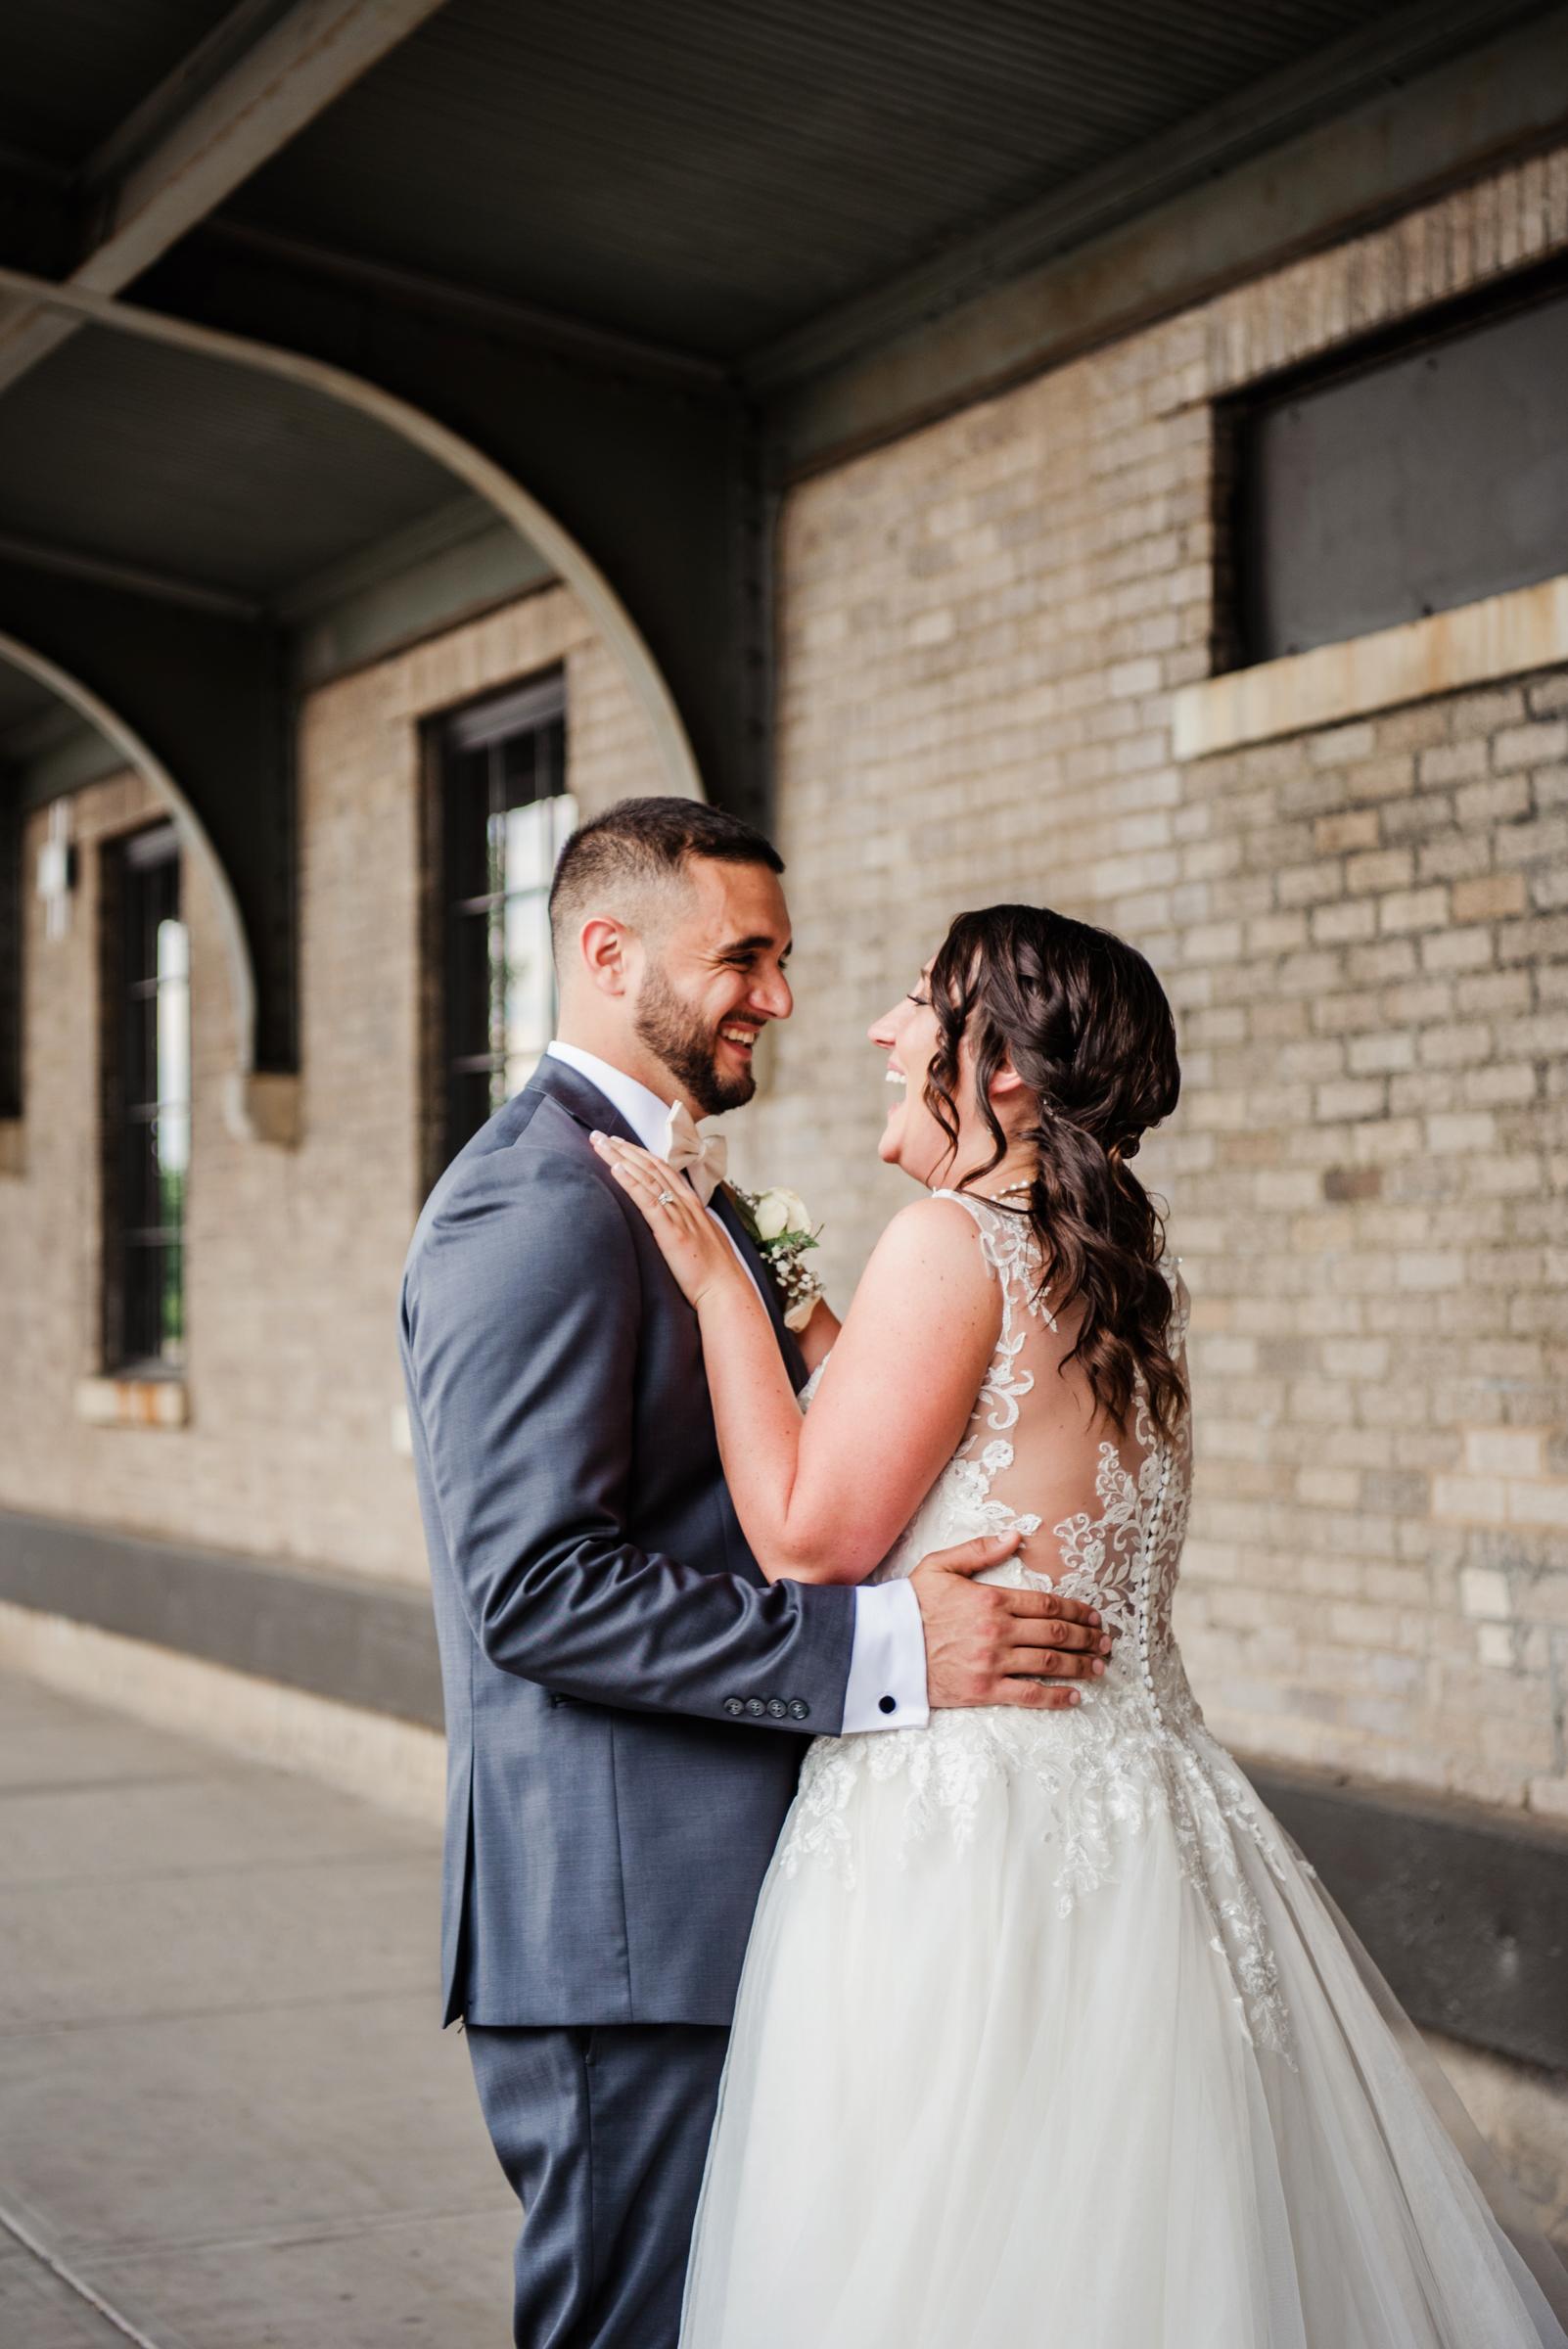 Historic_Old_St_Johns_Church_Valentinos_Banquet_Hall_Central_NY_Wedding_JILL_STUDIO_Rochester_NY_Photographer_DSC_6424.jpg